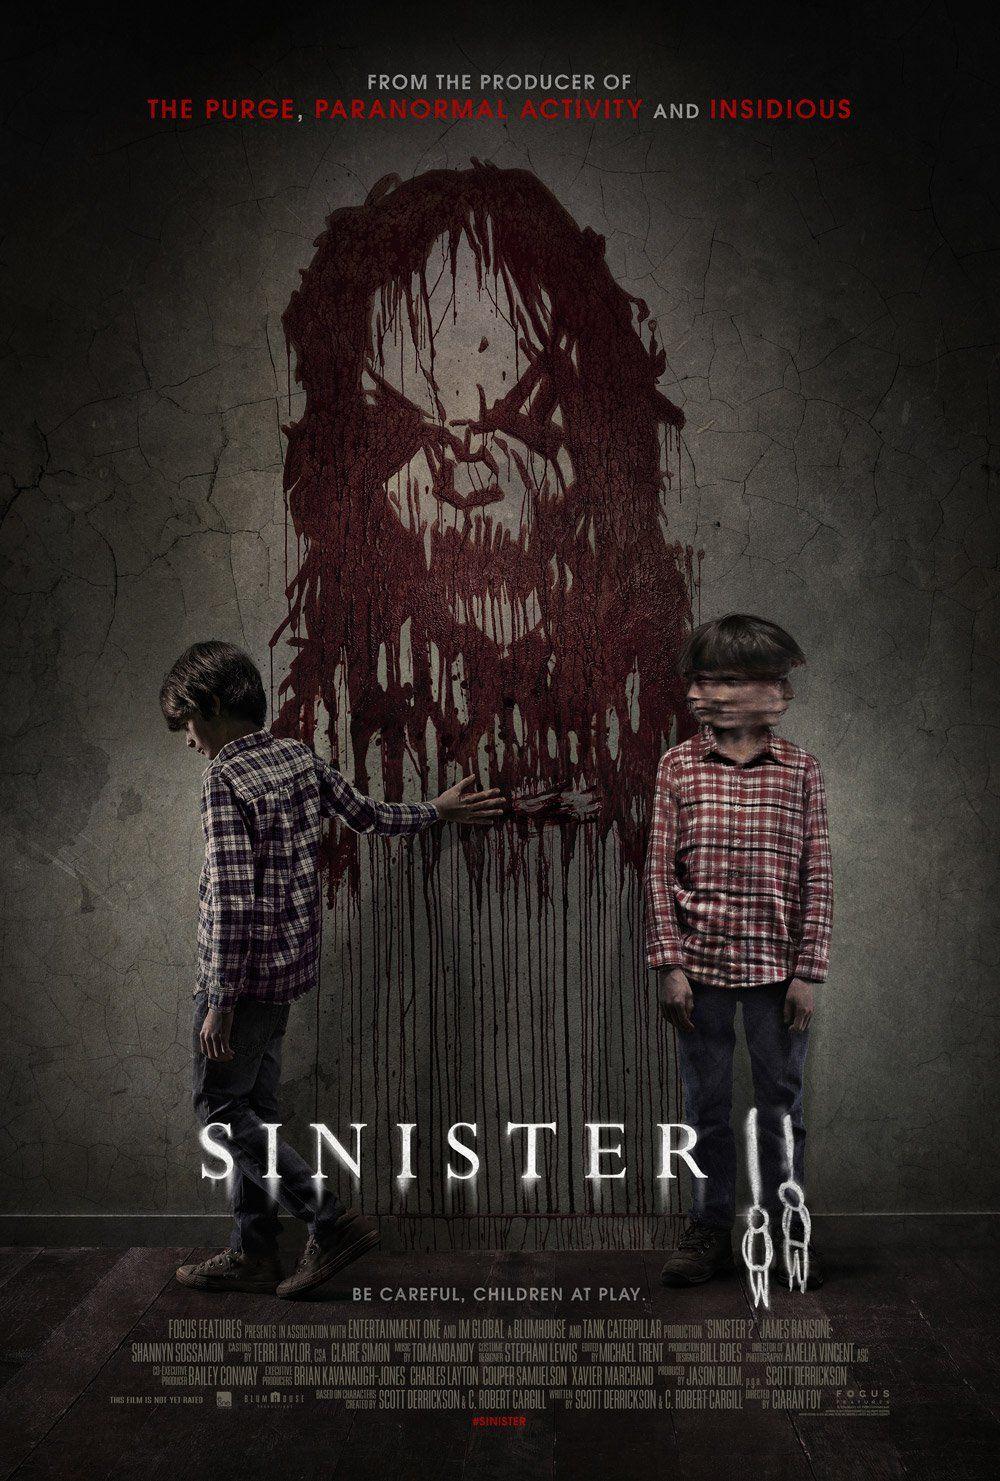 Hellhorror Com New Horror Movies News Trailers Reviews Horror Movies Scary Movies Best Horror Movies